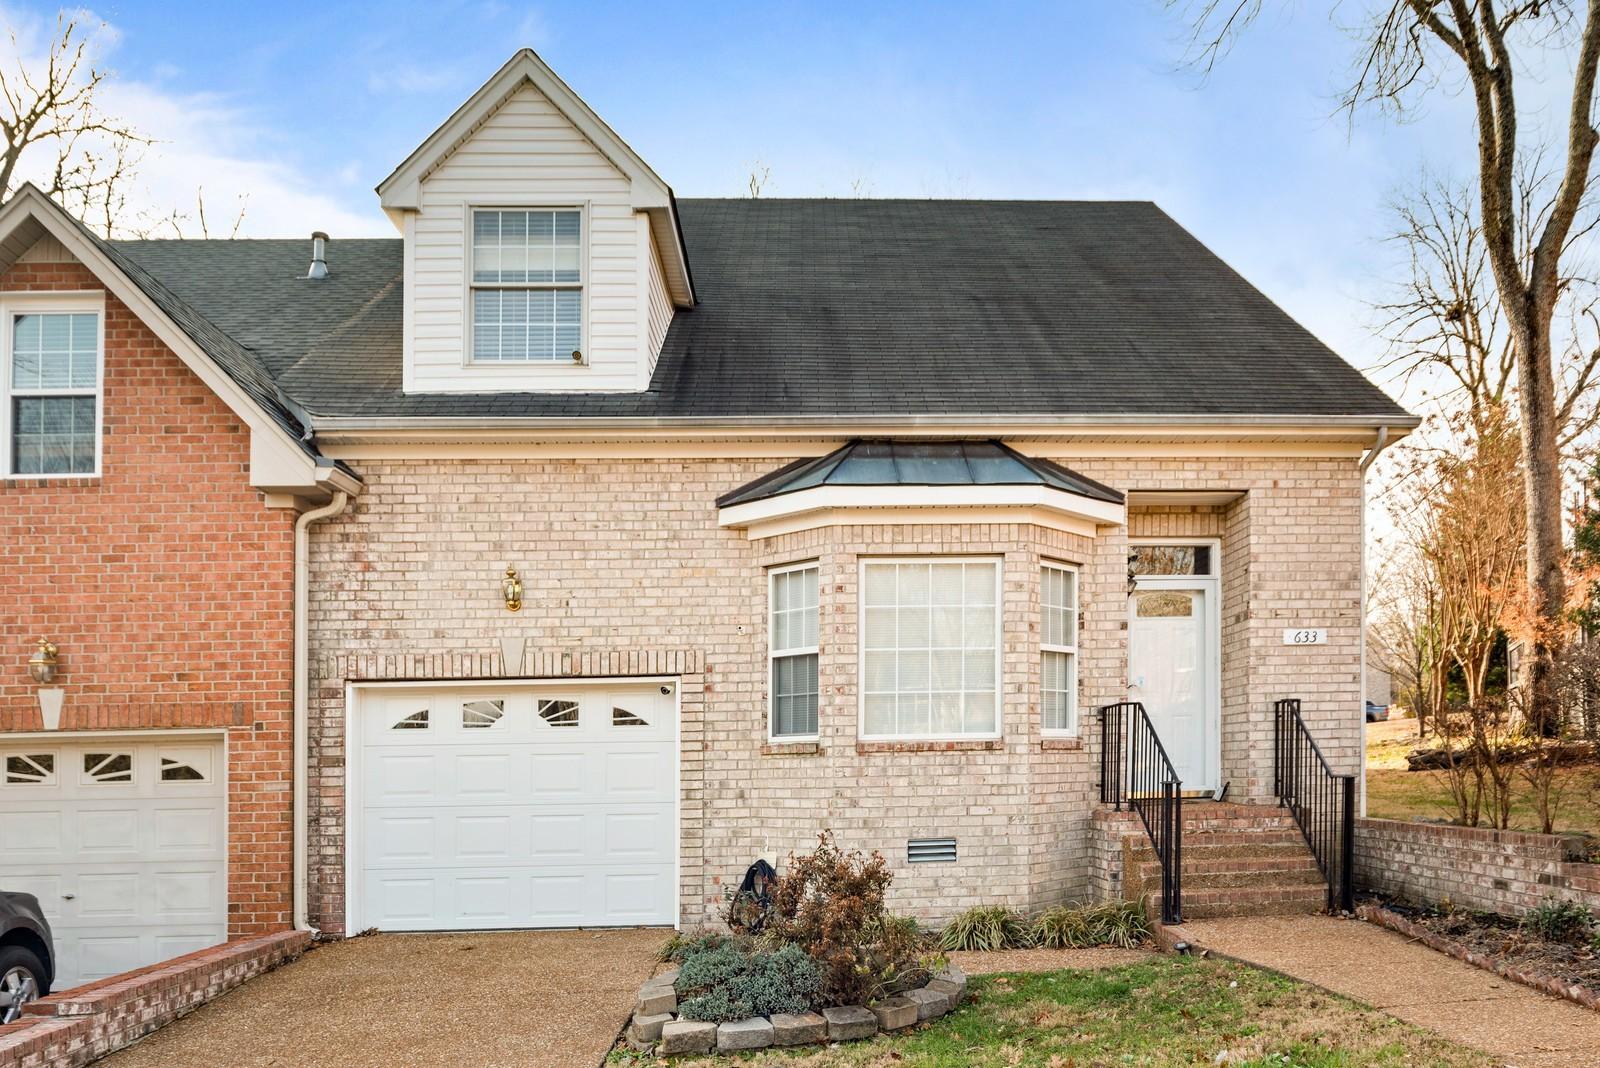 633 Glenn Cir, Madison, TN 37115 - Madison, TN real estate listing